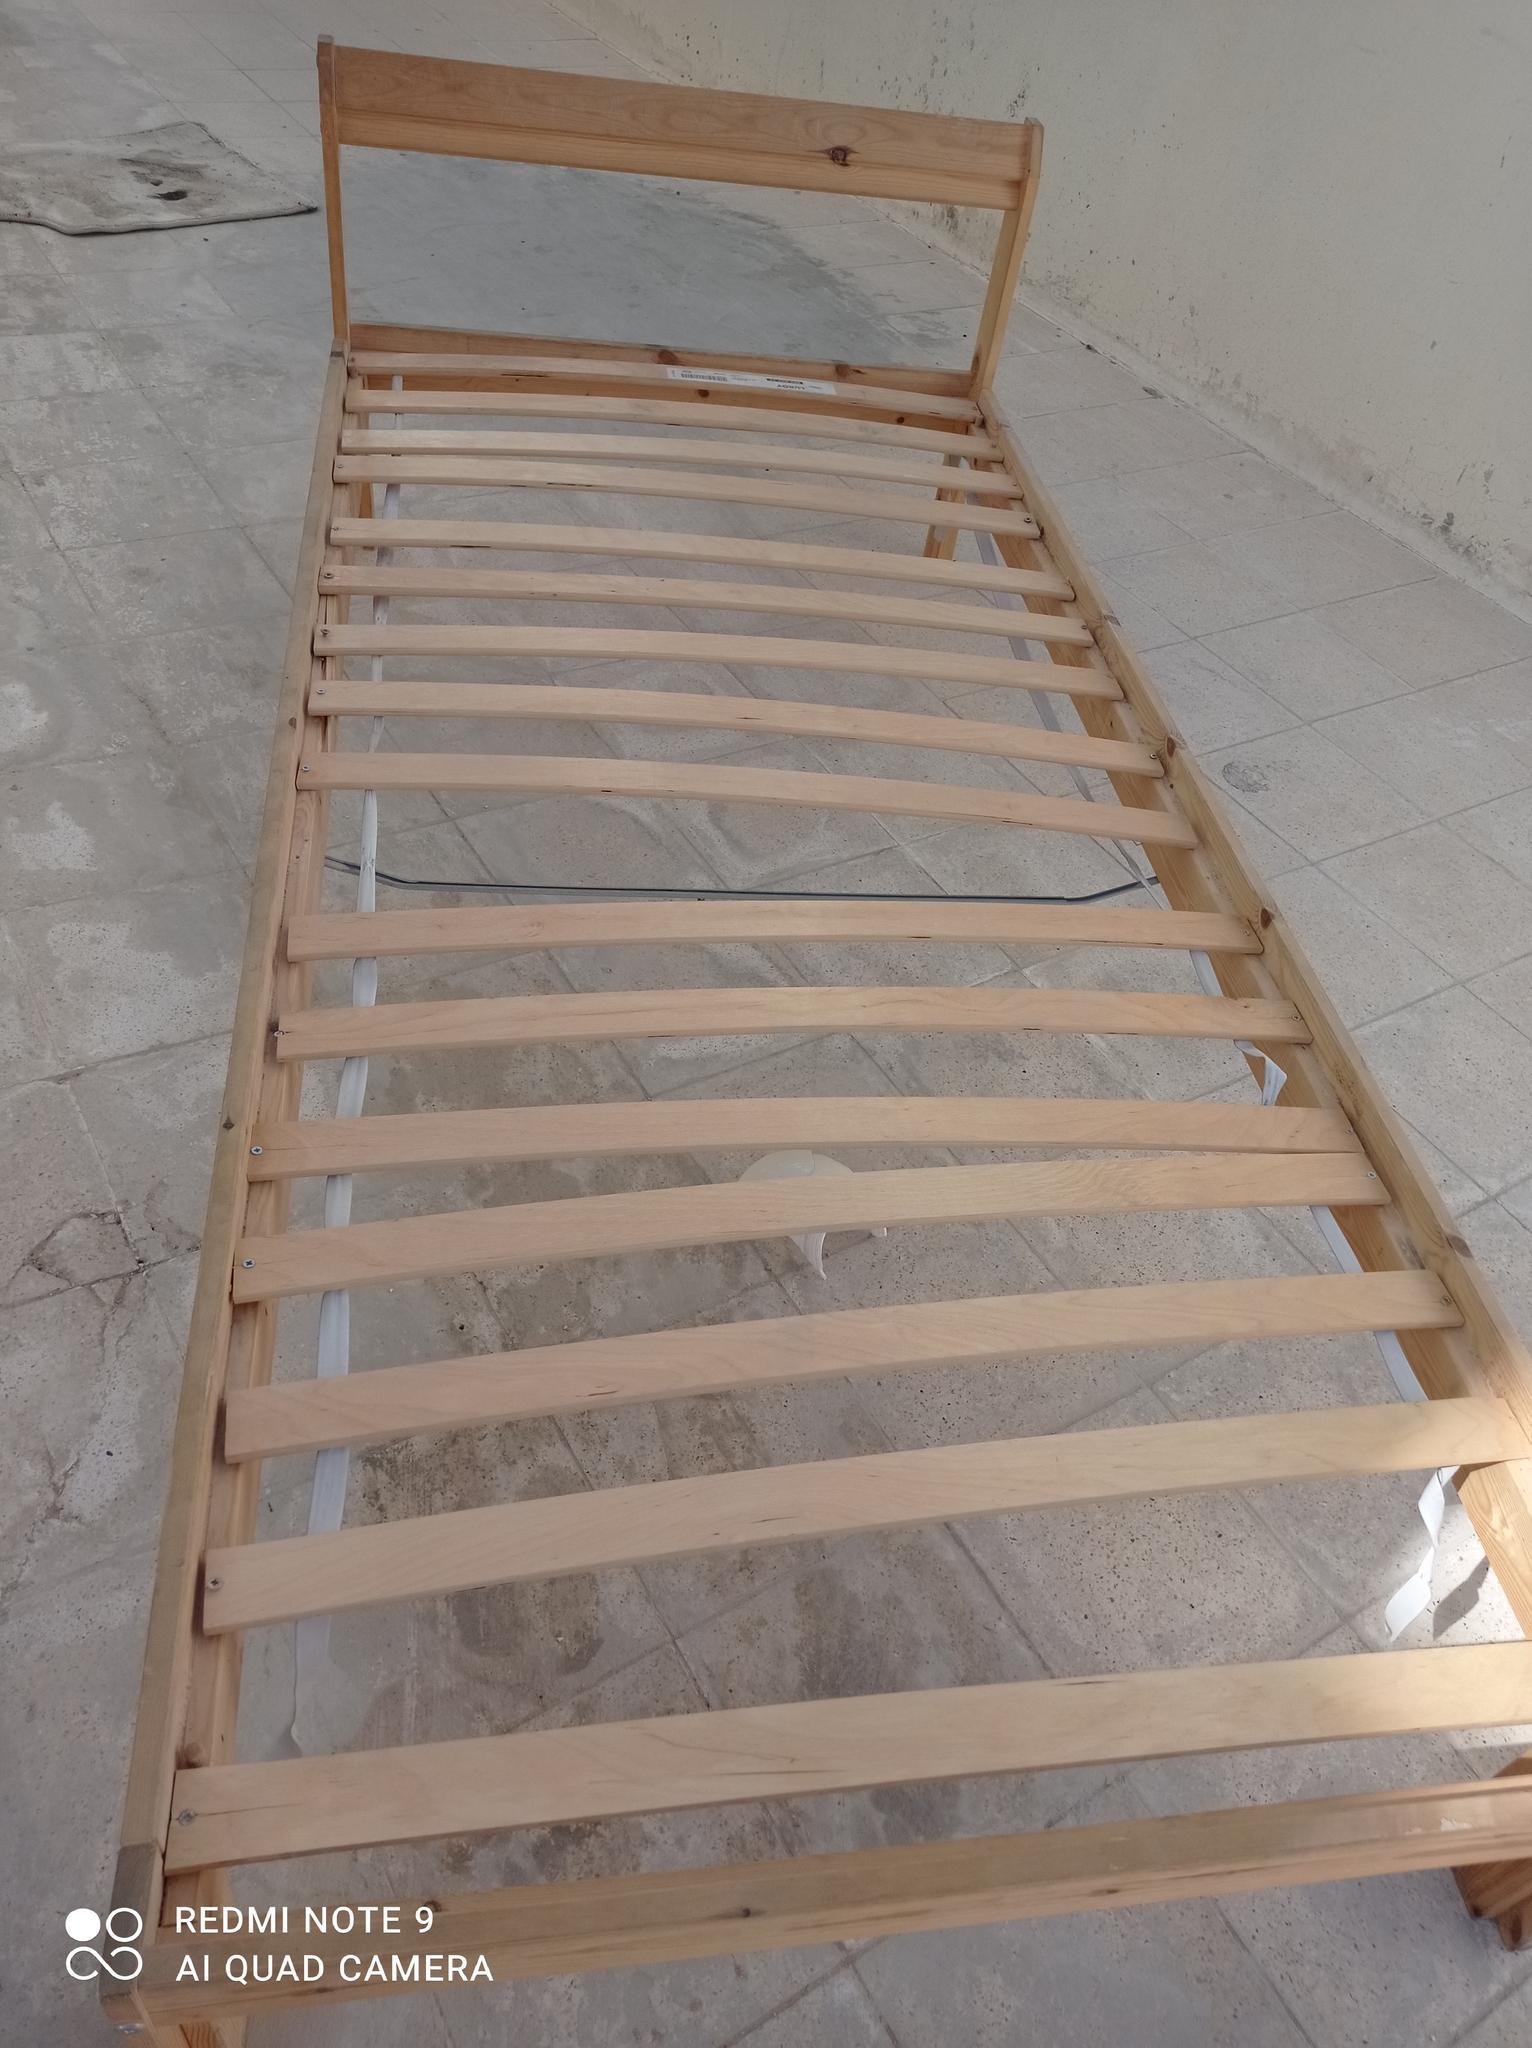 Single cot